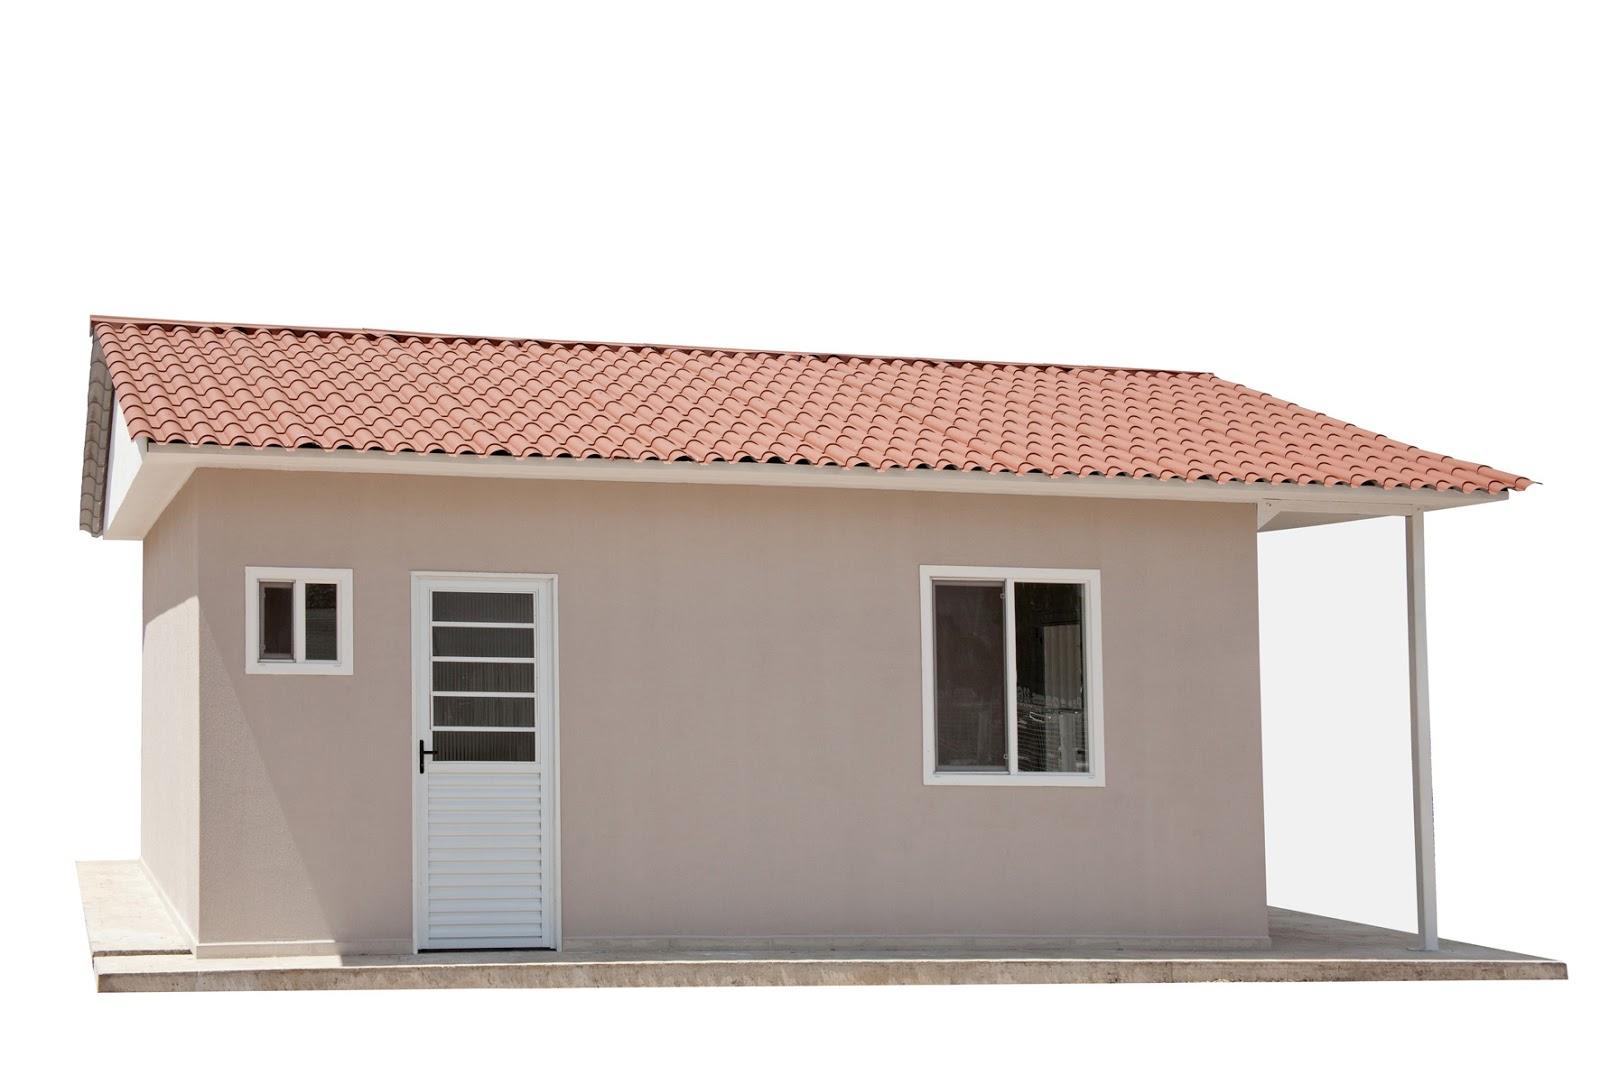 #885544 ADESP: Novo método constrói casas em até 15 dias 1816 Janela De Aluminio Pode Pintar